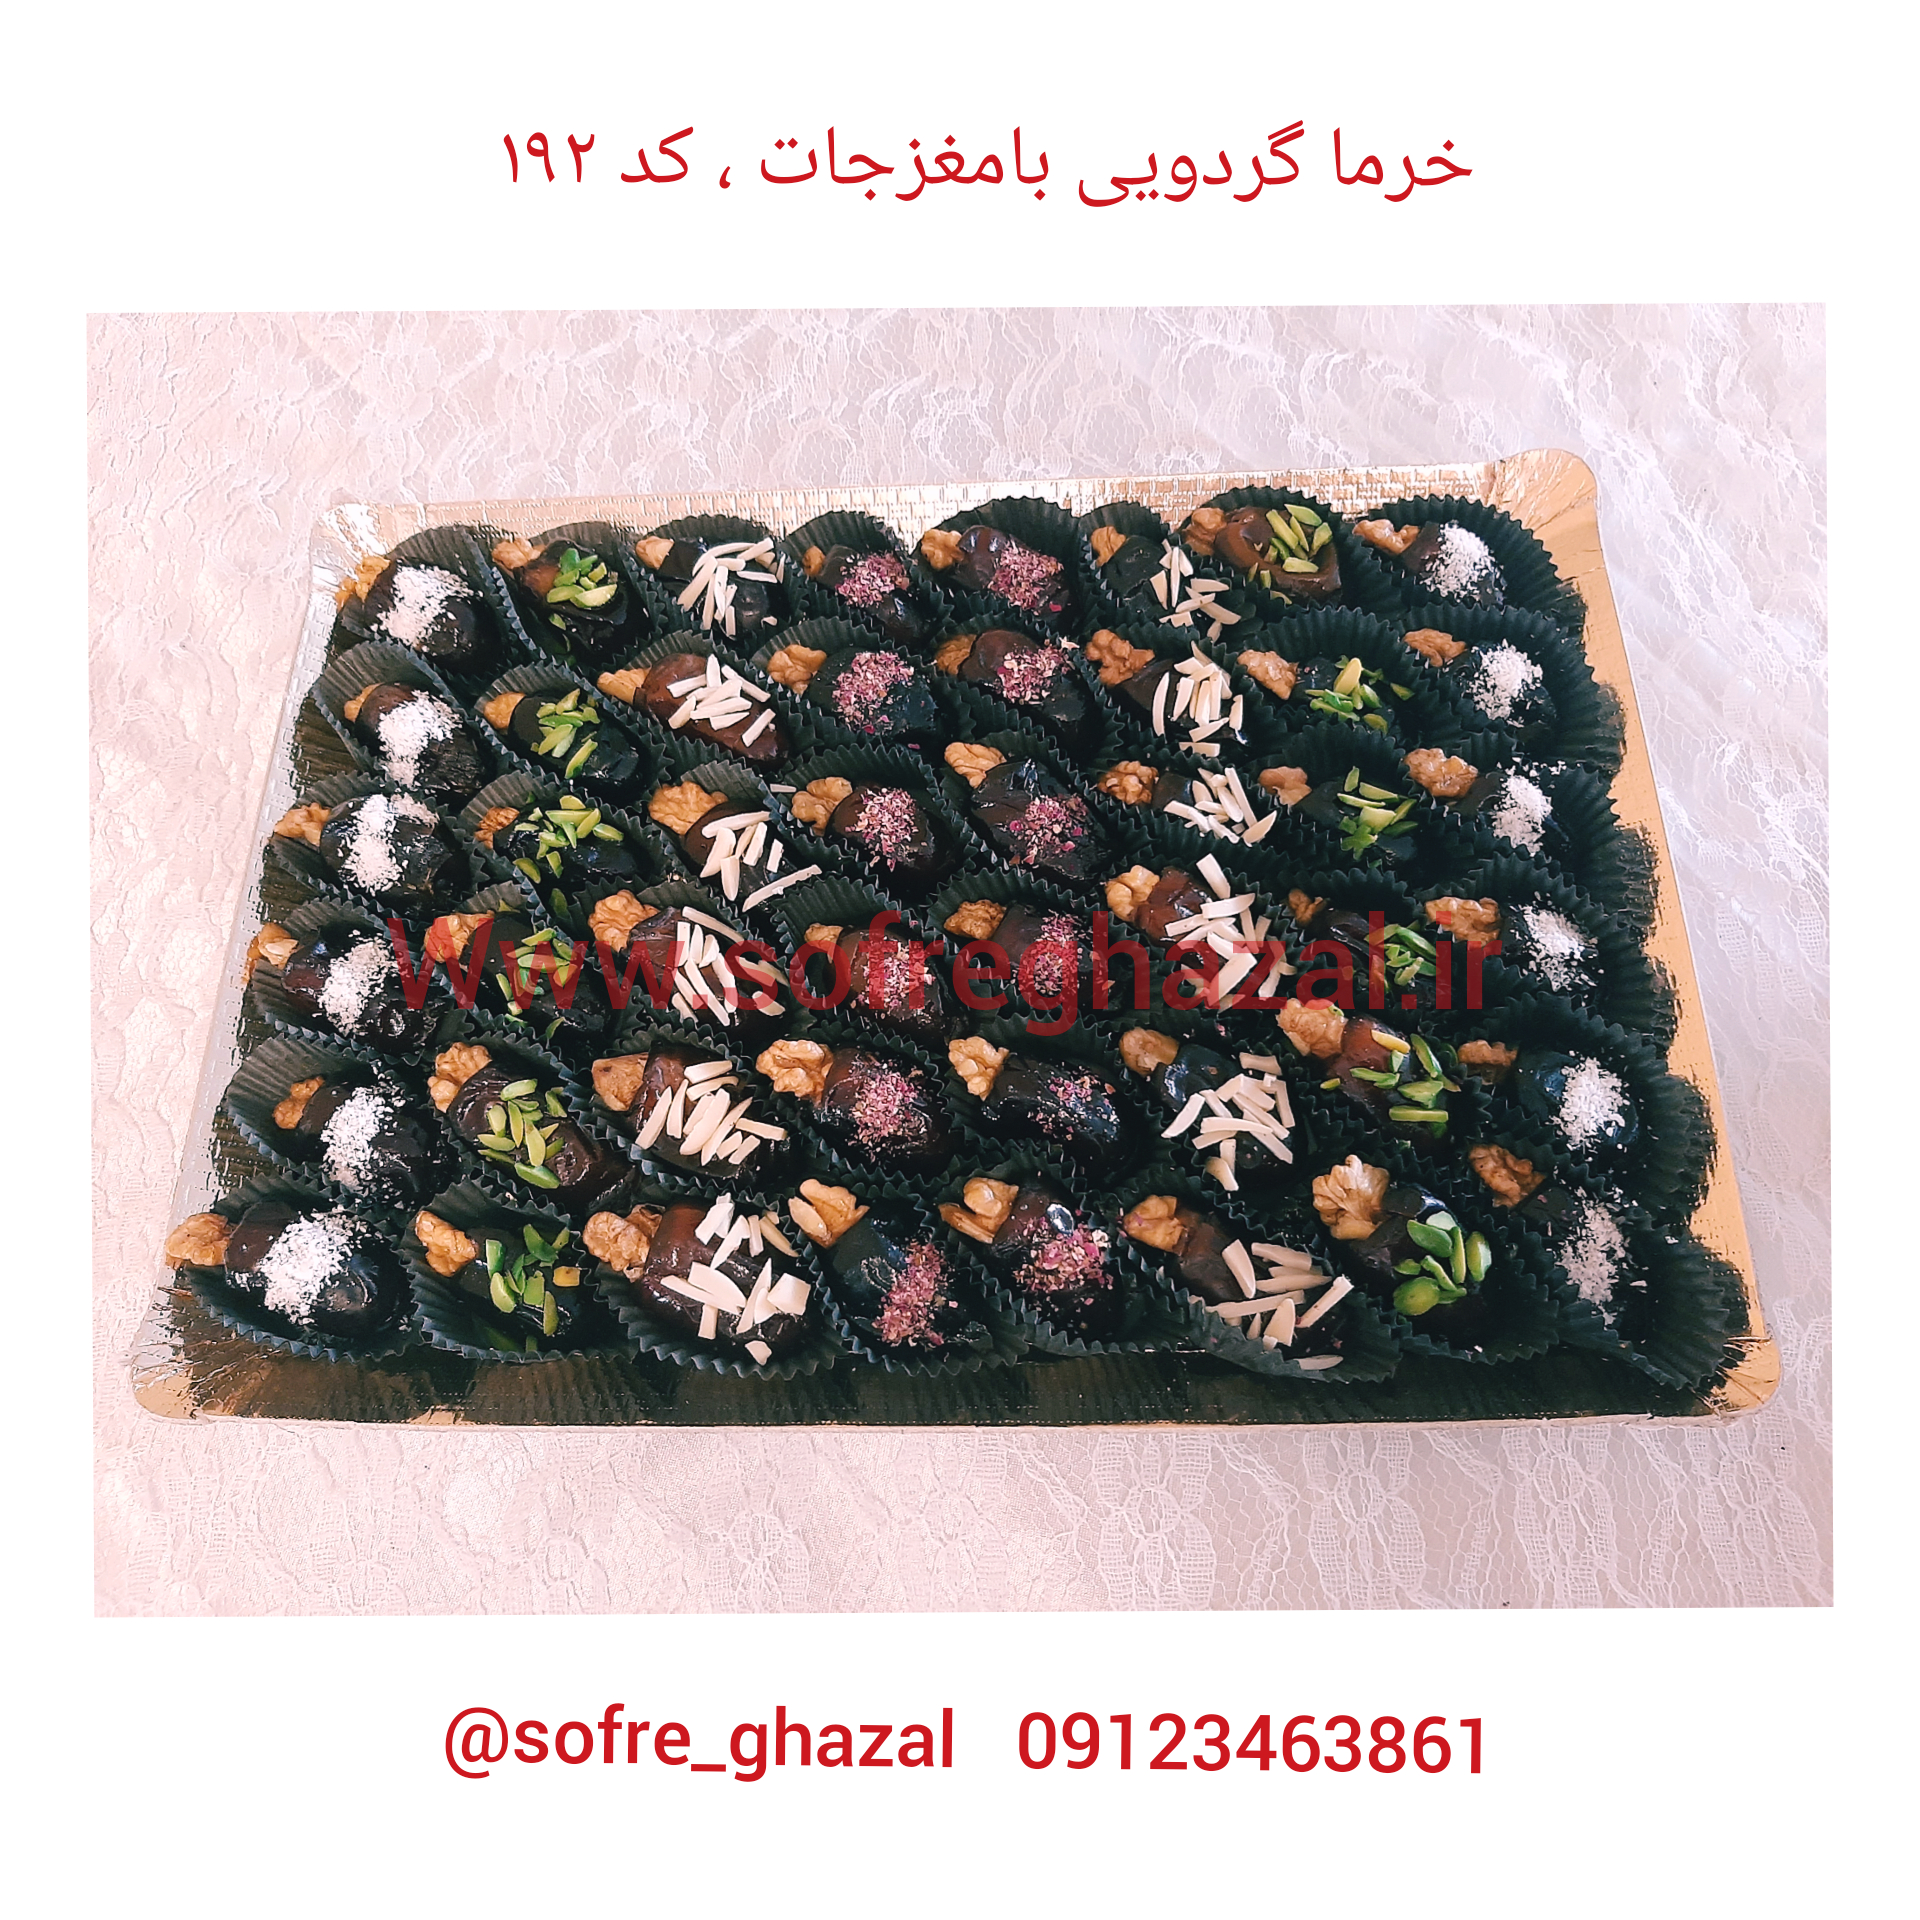 PhotoCollage_20210107_202902767